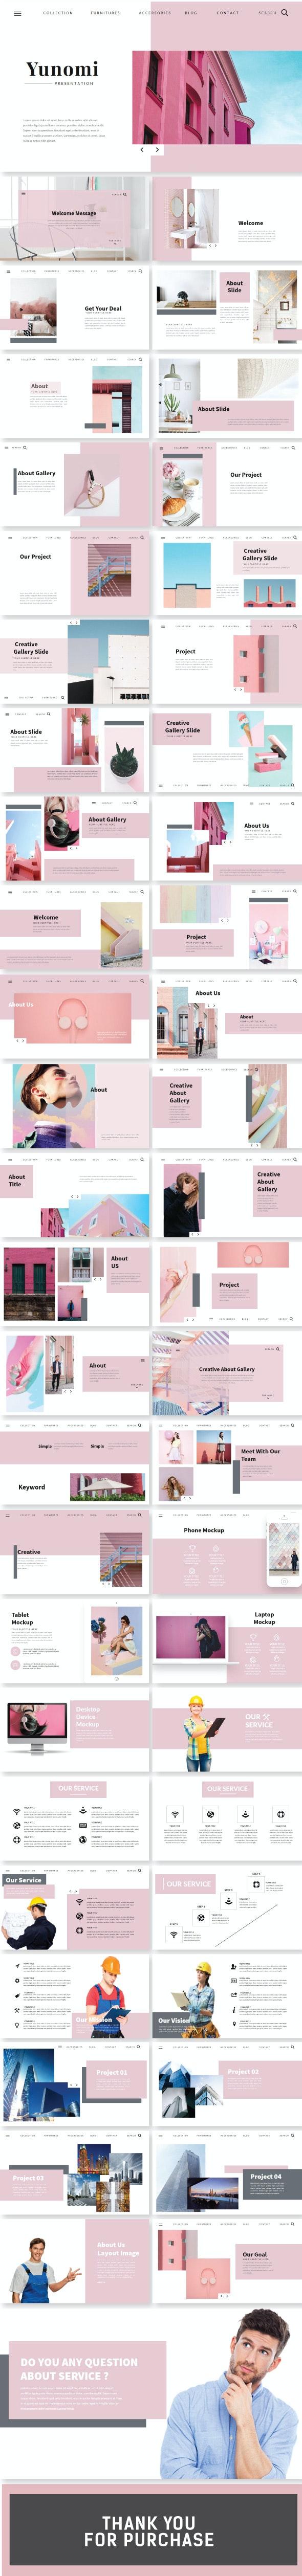 Yunomi Google Slide - Google Slides Presentation Templates